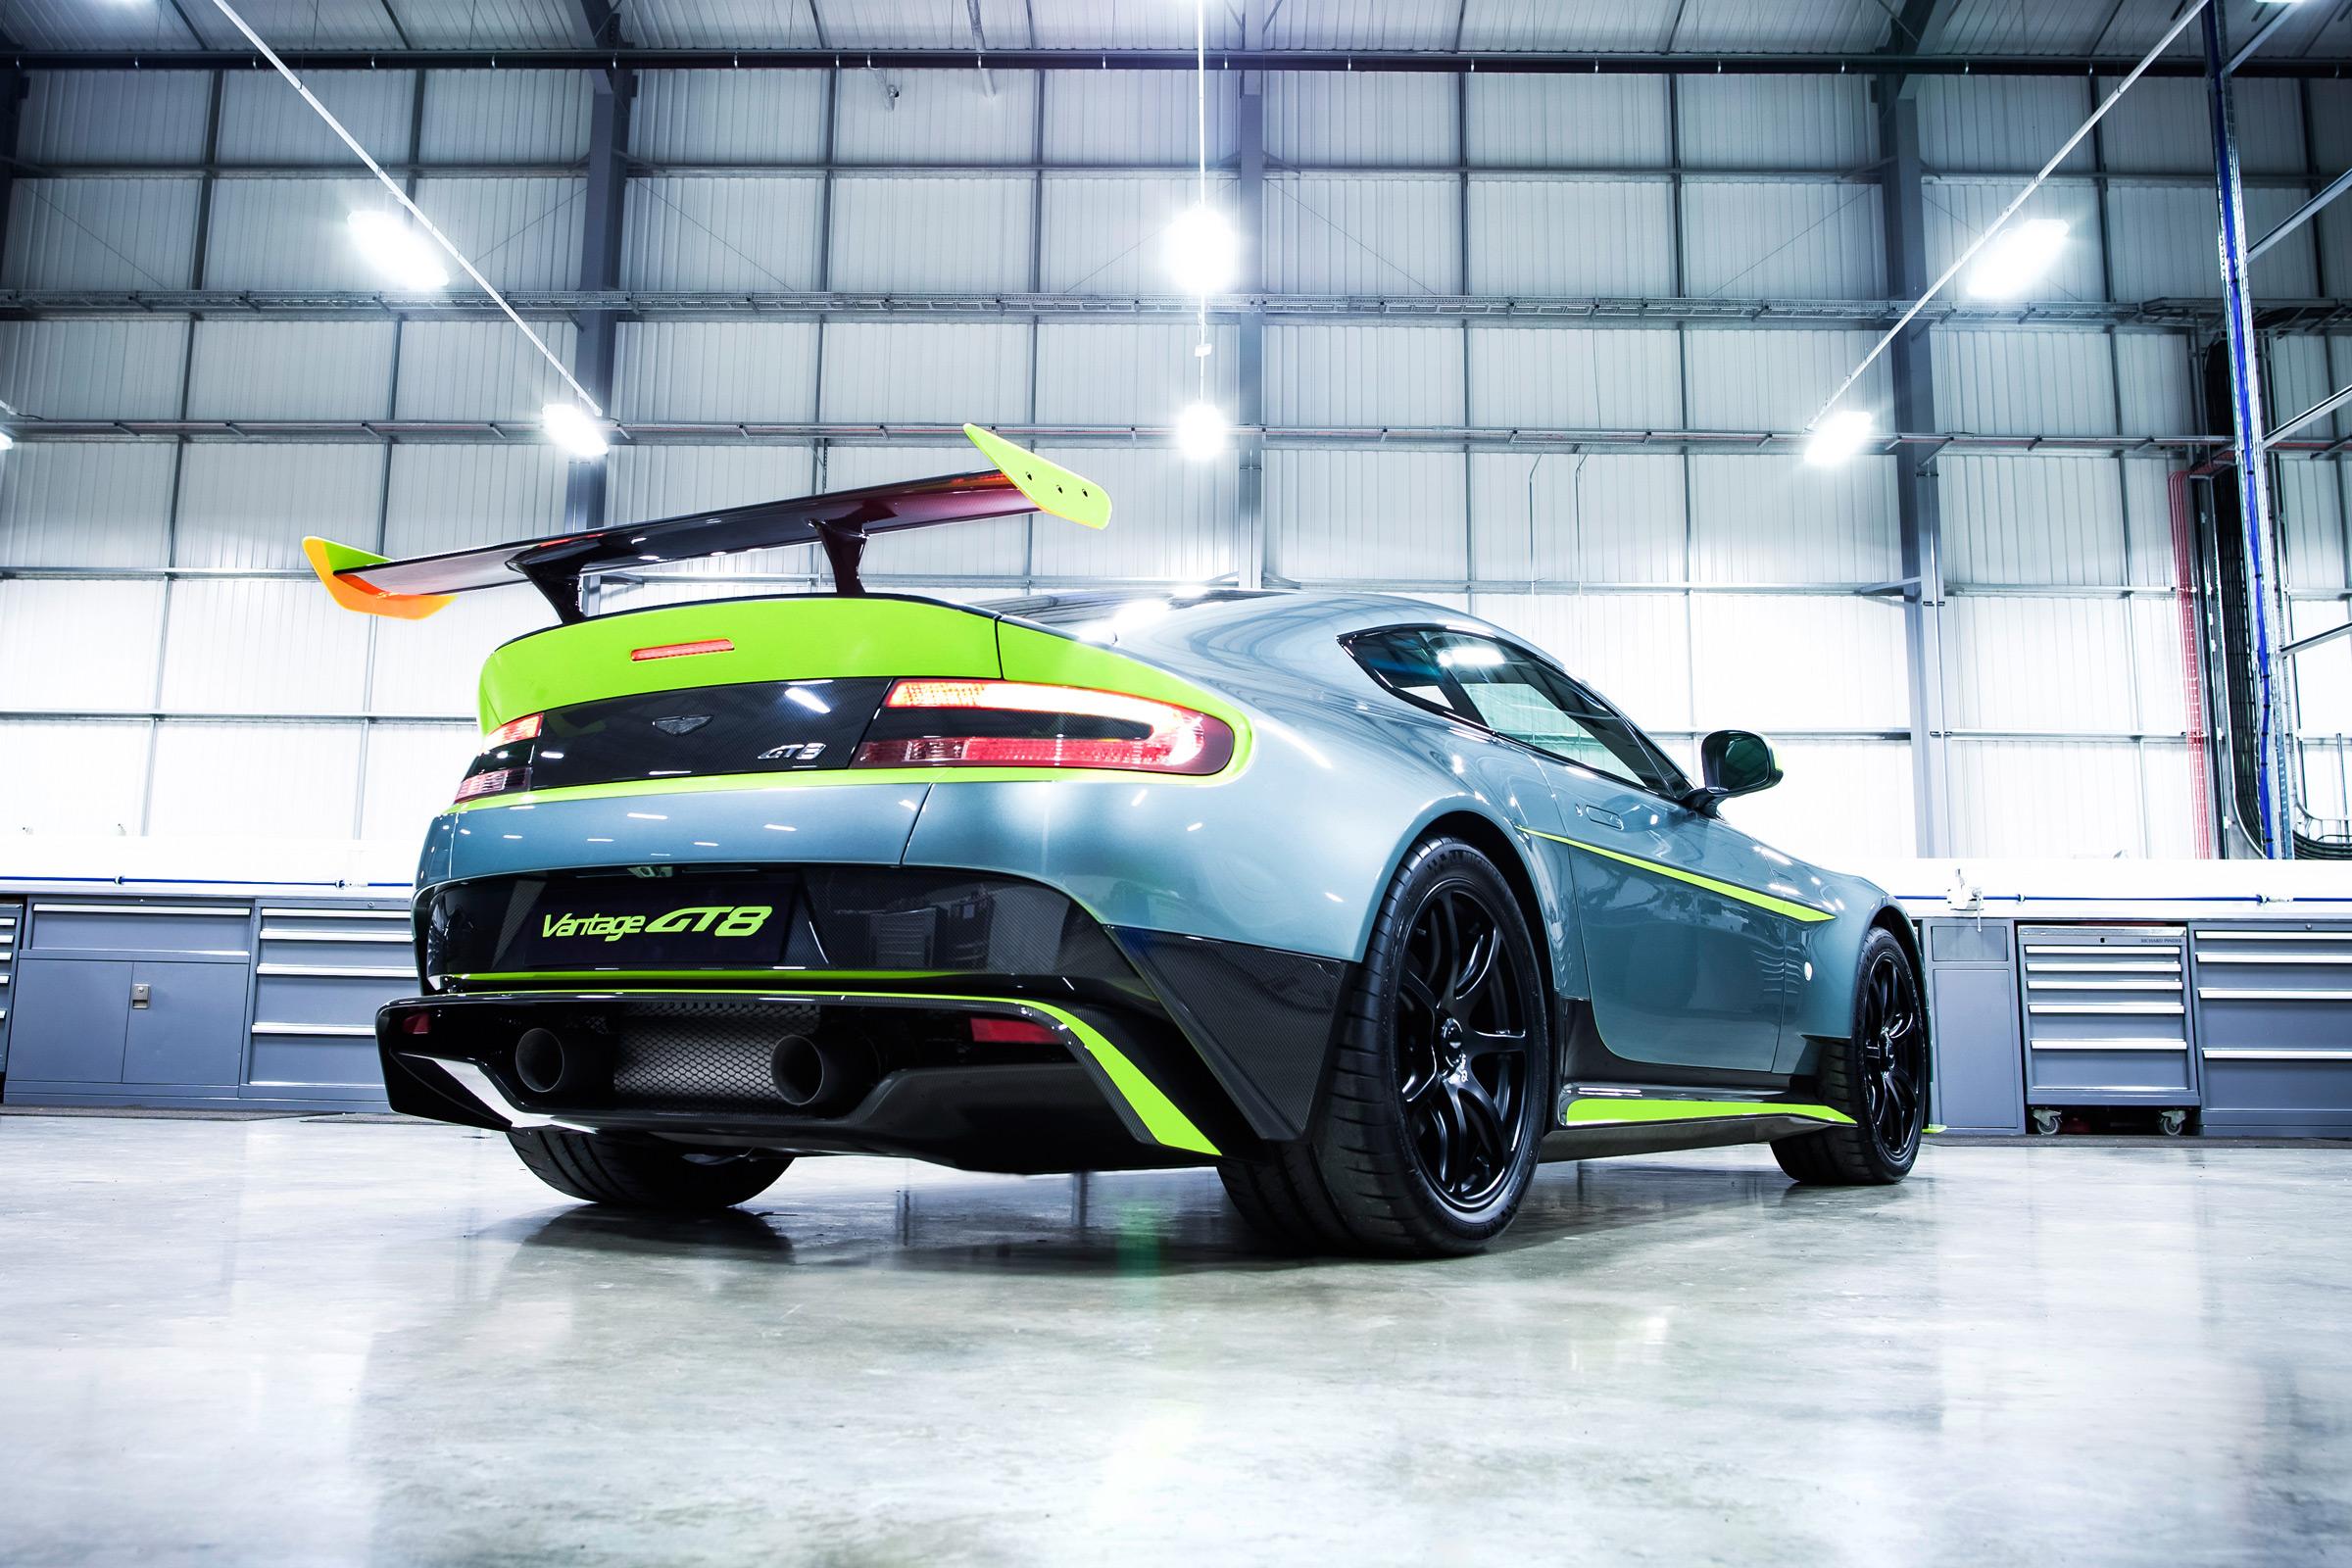 Aston Martin Vantage Gt8 Details On All New 165k Track Car Auto Express